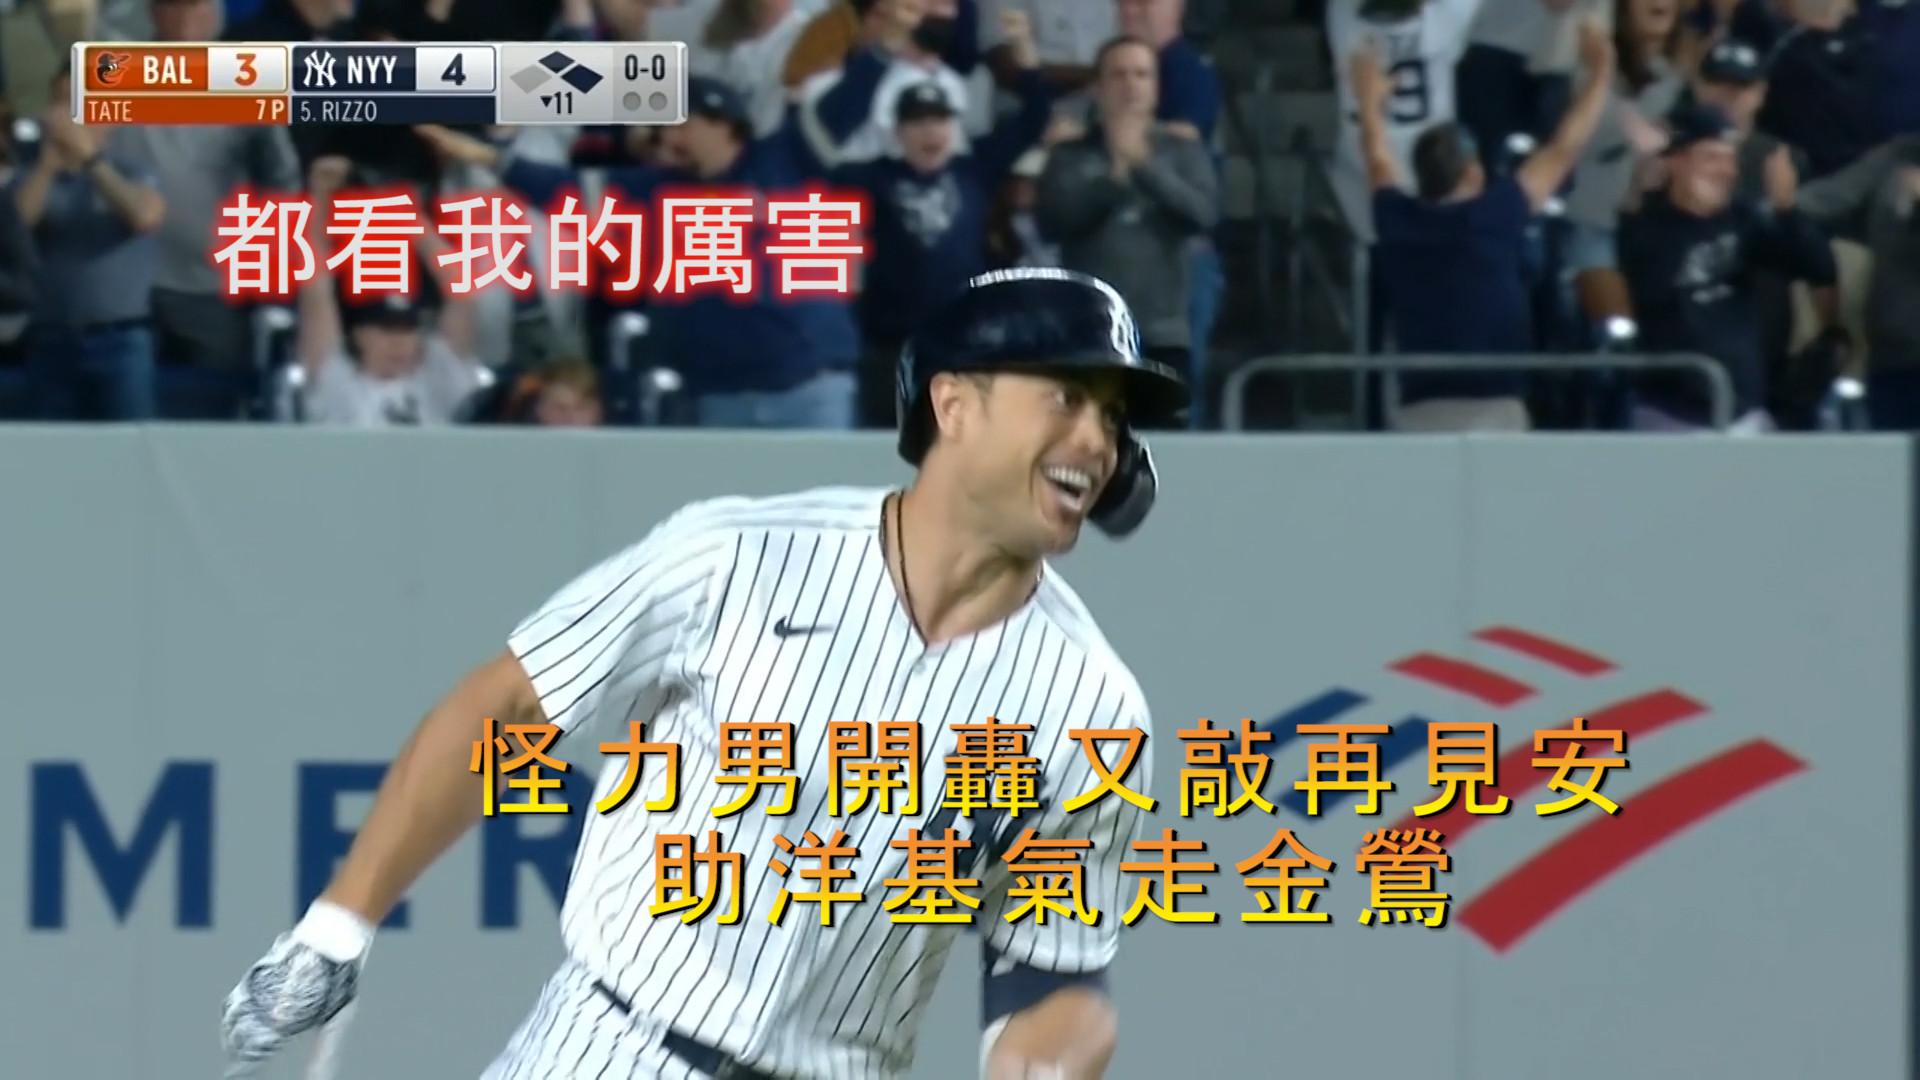 【MLB看愛爾達】全場都看怪力男 洋基險勝金鶯 09/04